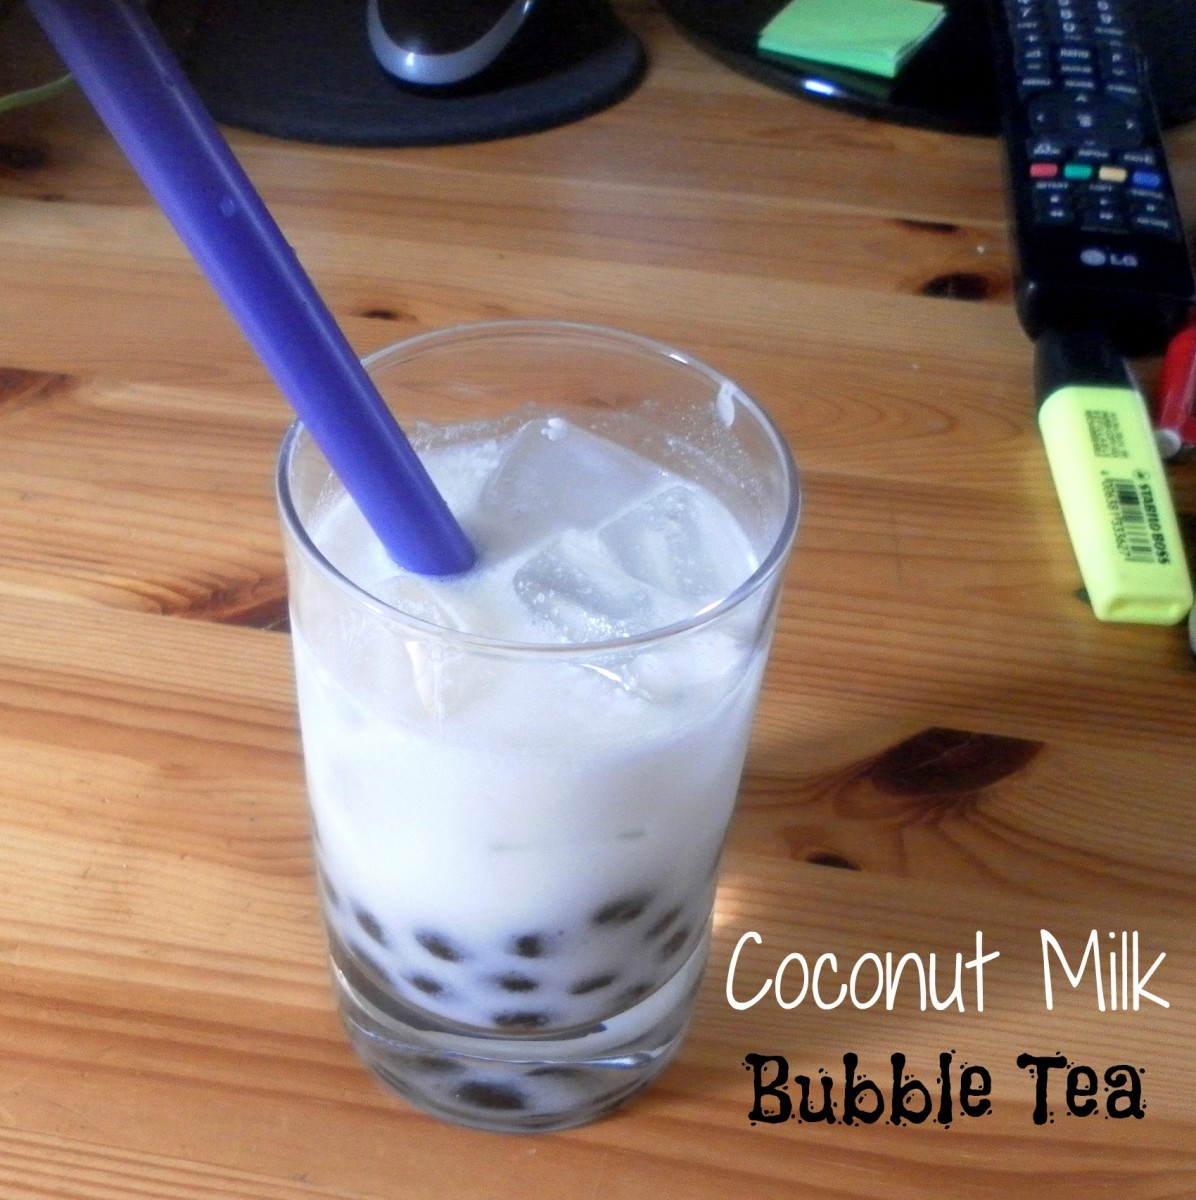 Another fun DIY bubble tea uses coconut milk as a base.